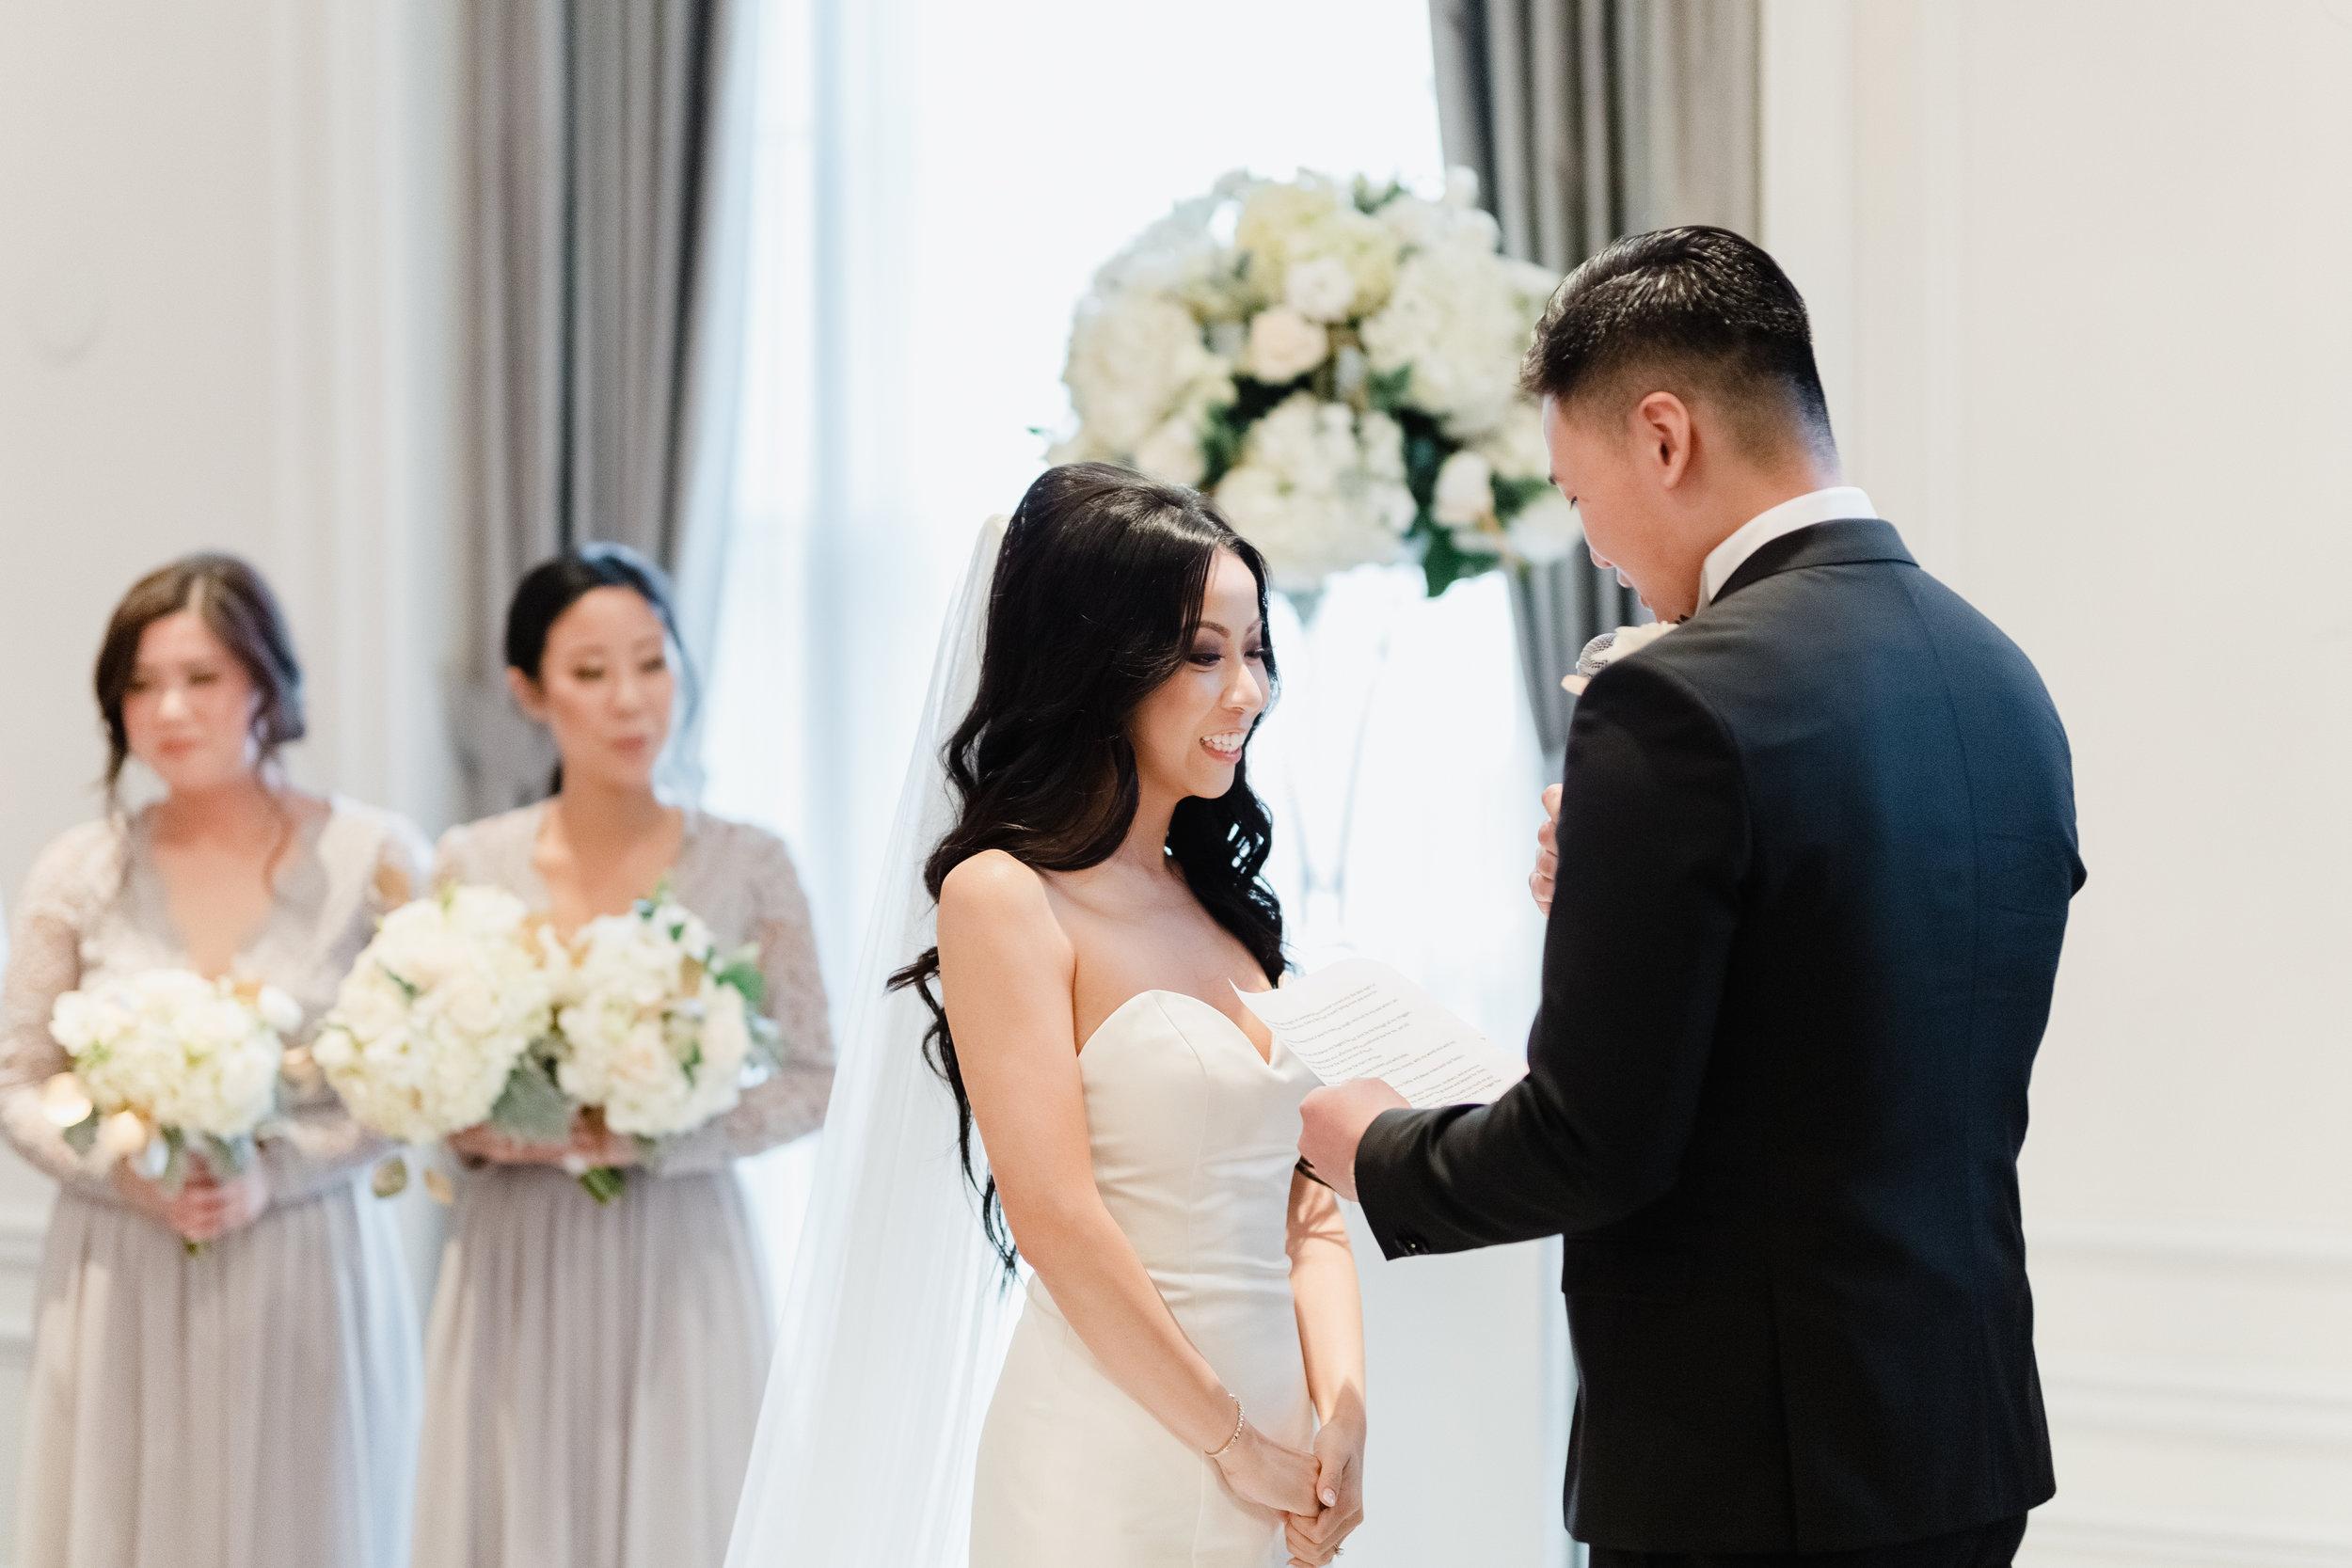 HeraStudios_Selects_Full_KatrinaAndrew_Wedding_Version2-381.jpg